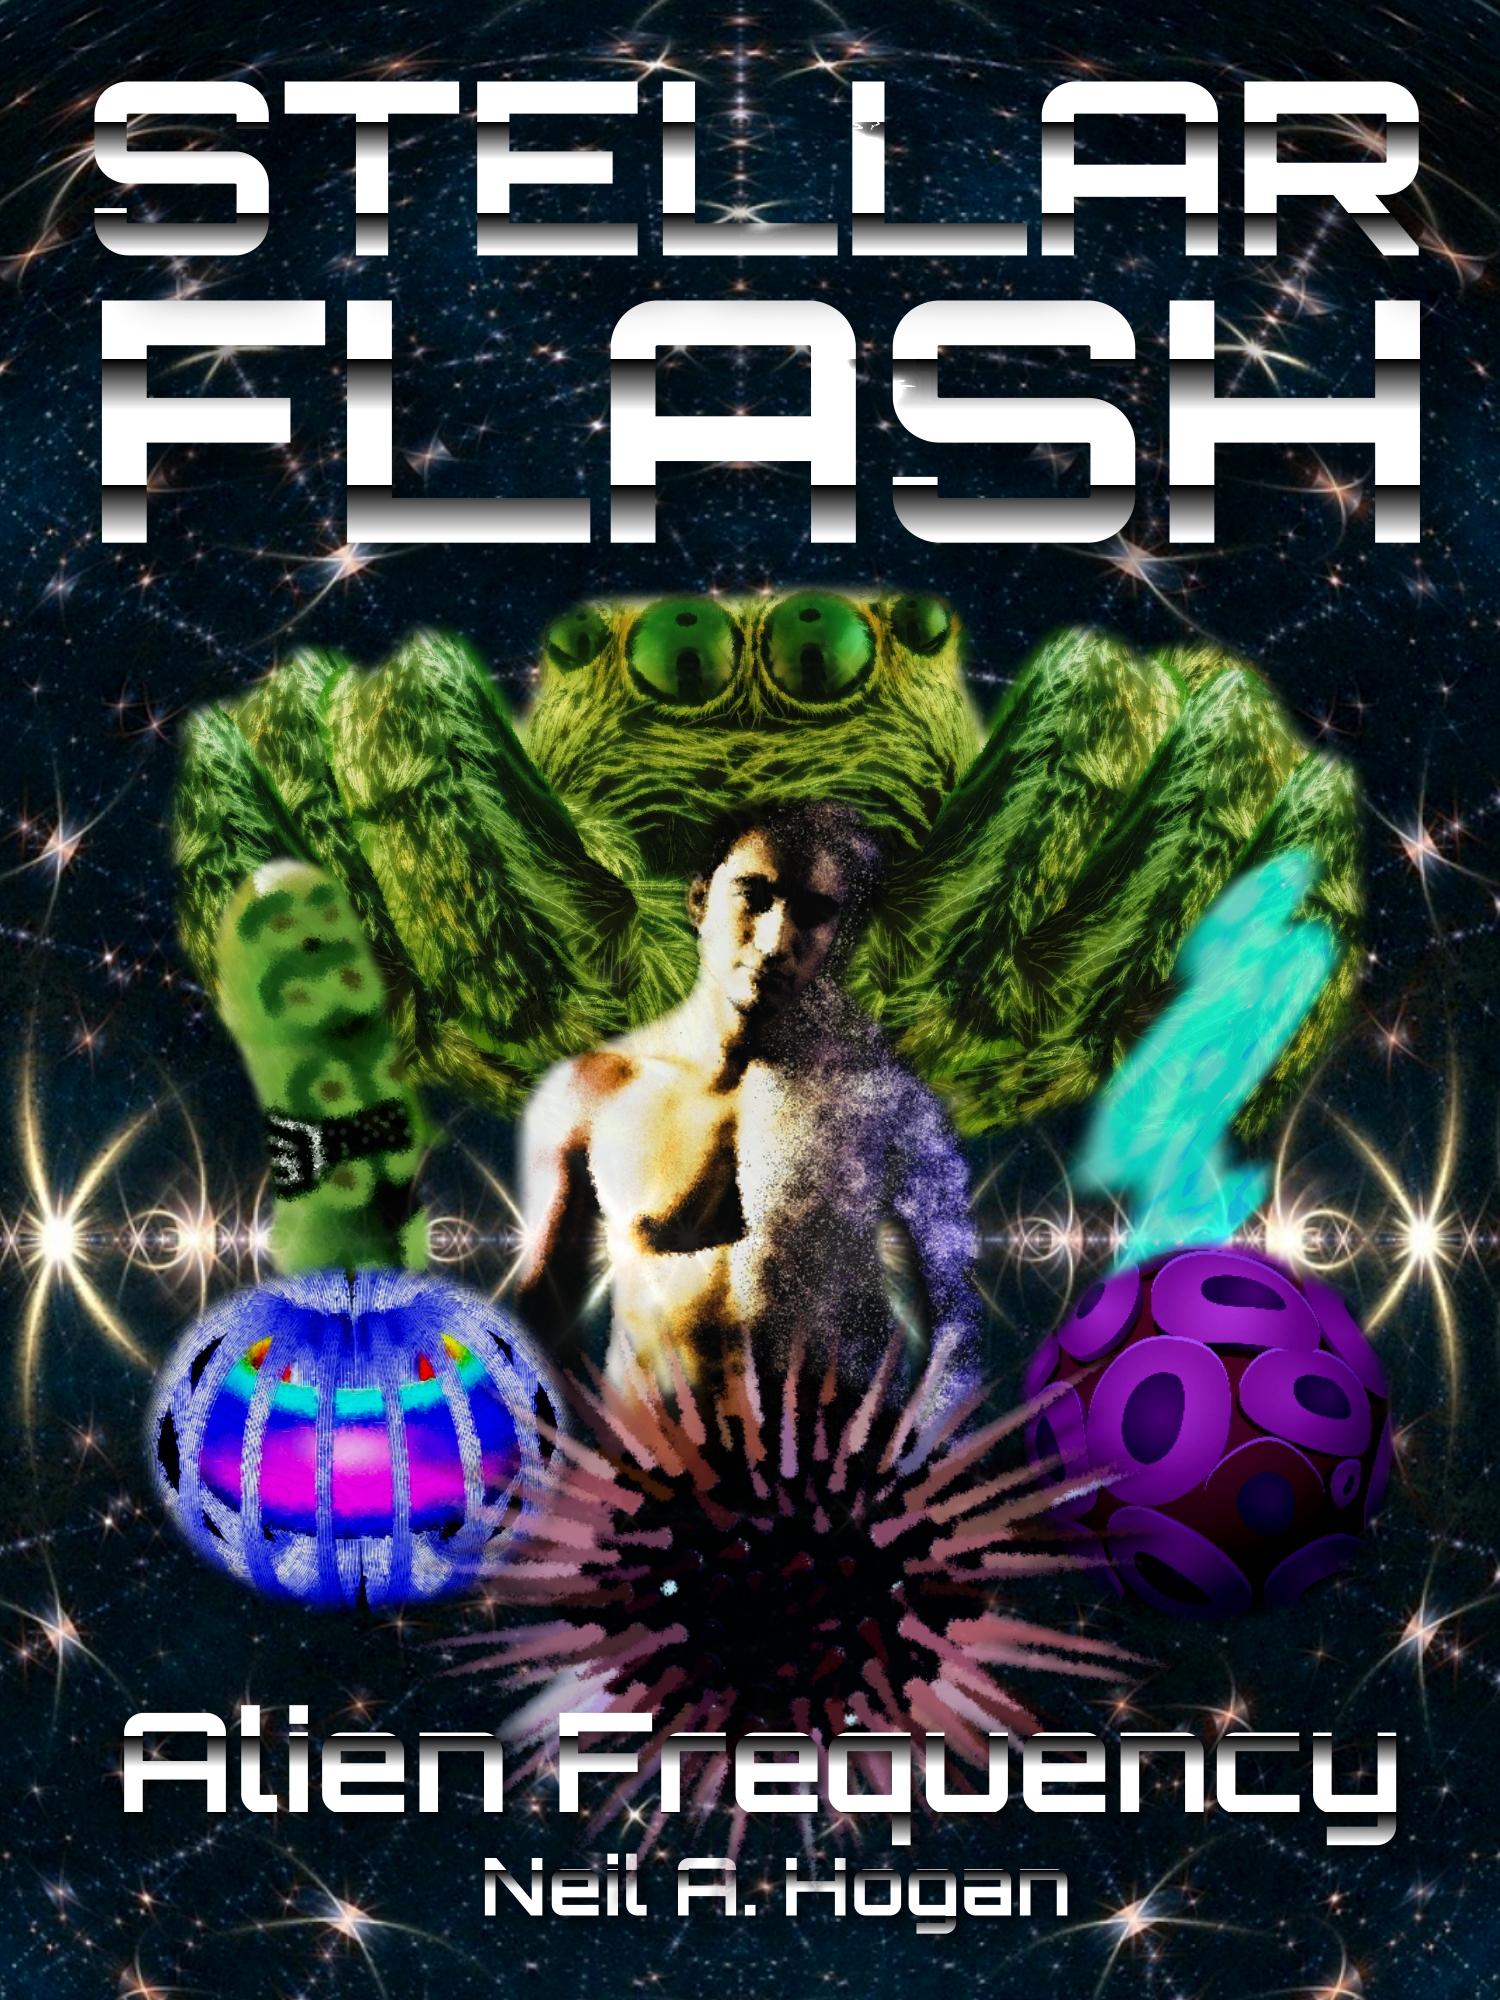 Stellar Flash Alien Frequency